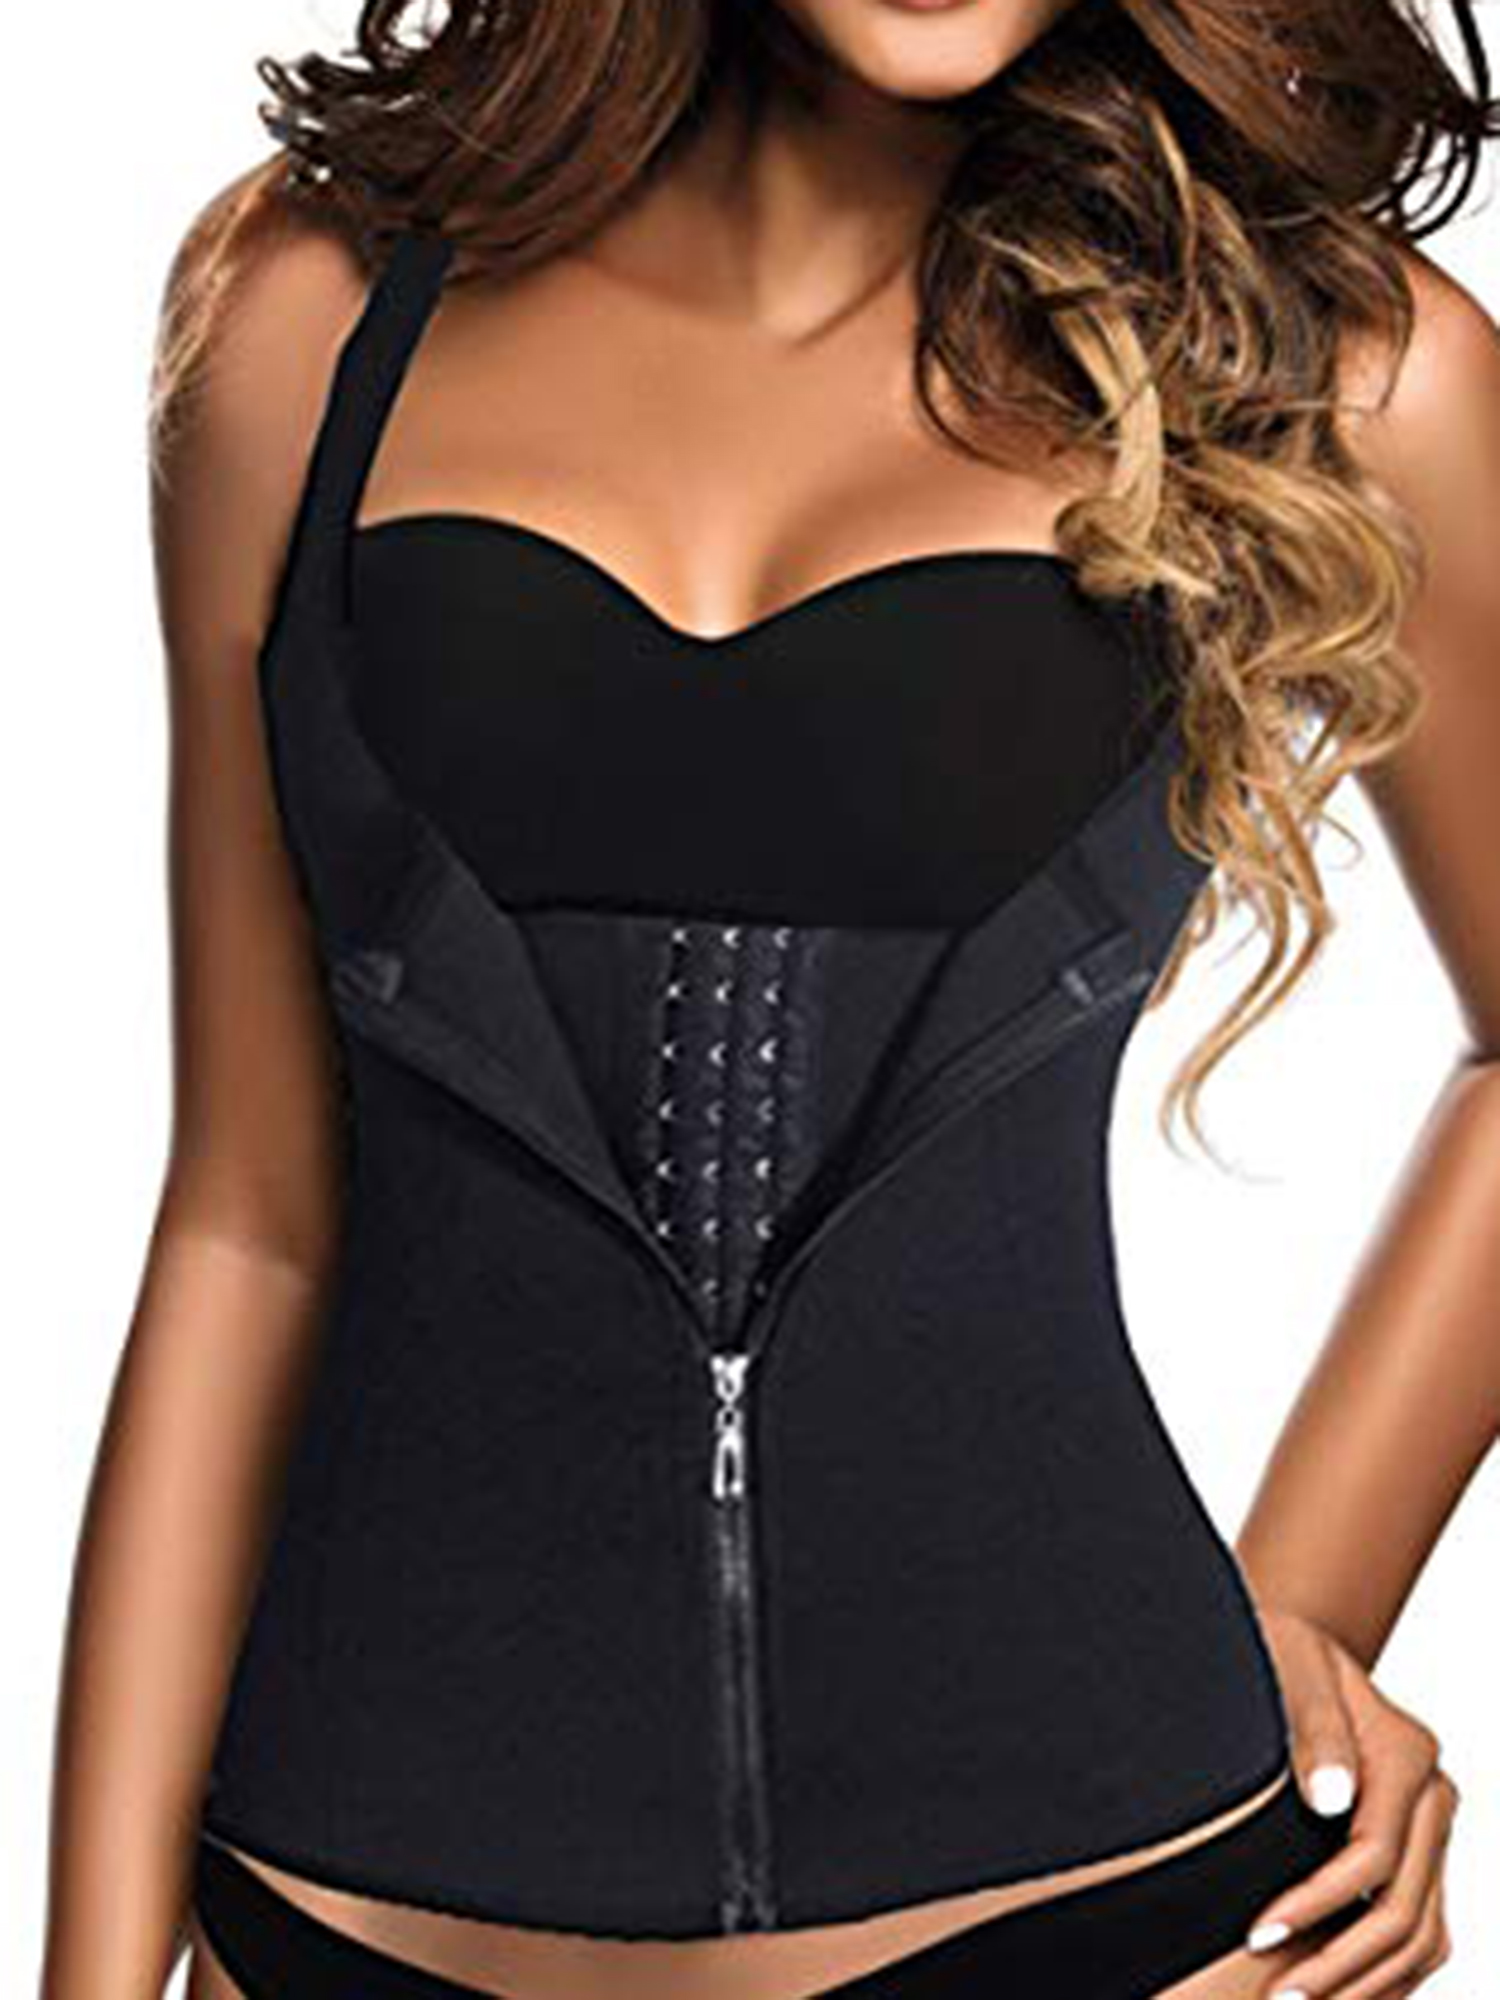 1da68ad7b5d SAYFUT - SAYFUT Women s Waist Trainer Corset Cincher Shaperwear for Weight  Loss Sport Workout Body Shaper Tummy Fat Burner - Walmart.com